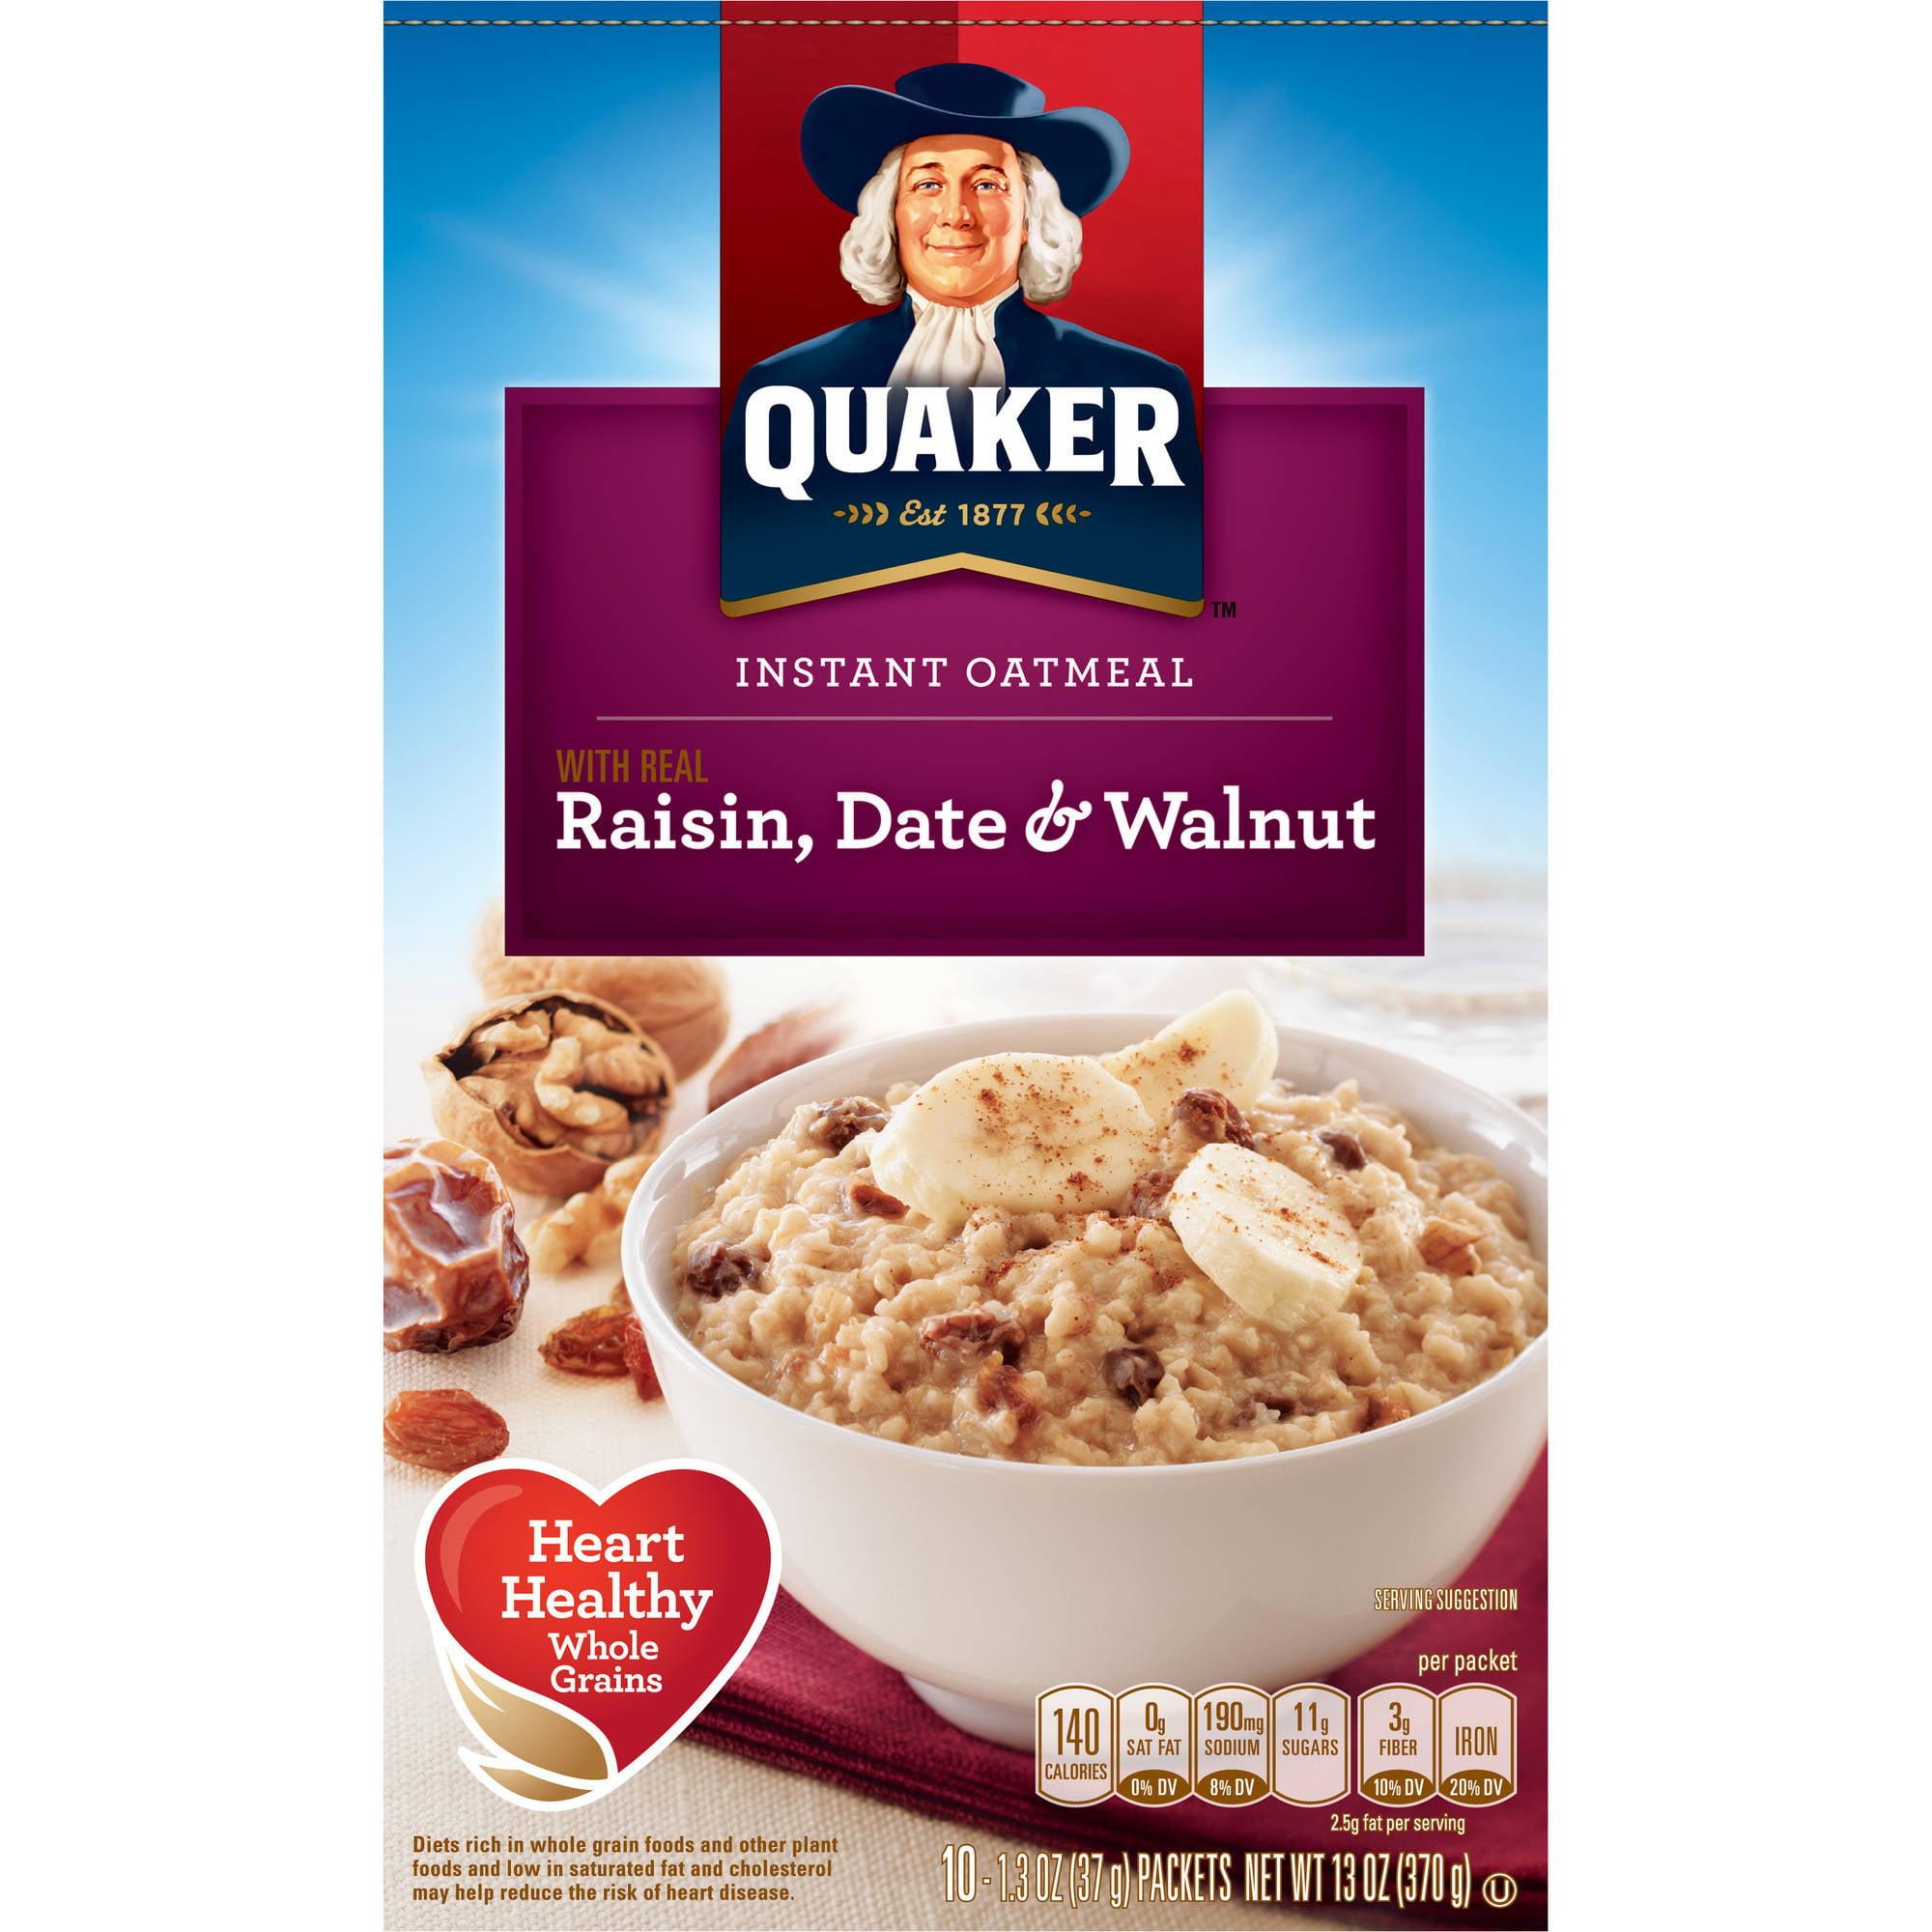 Quaker Raisin Date & Walnut Instant Oatmeal, 13 oz